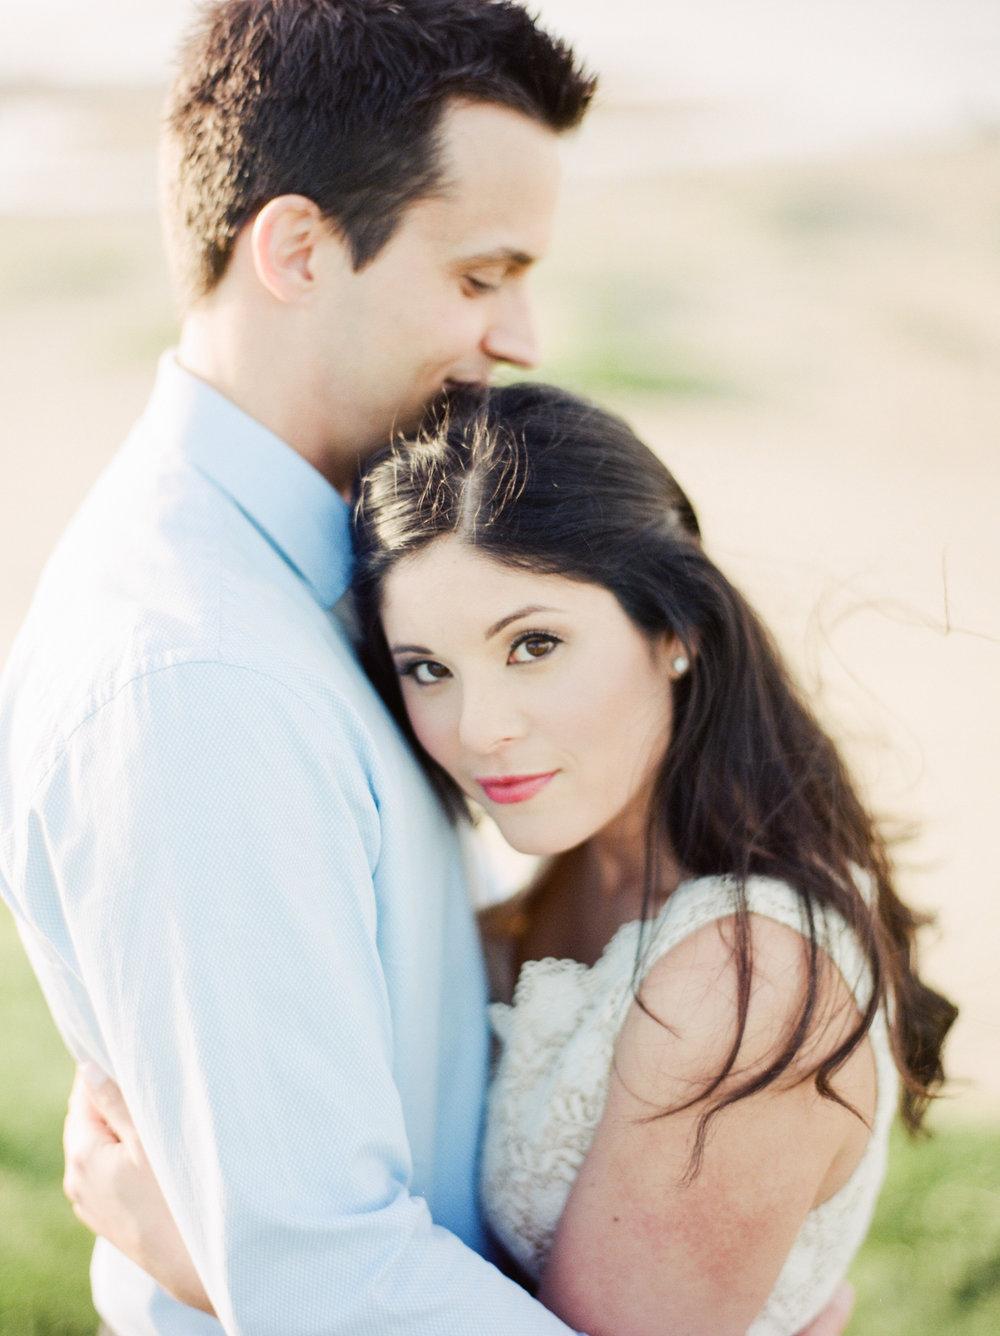 SAN FRANCISCO BRIDE AND GROOM WEDDING PHOTOGRAPHY